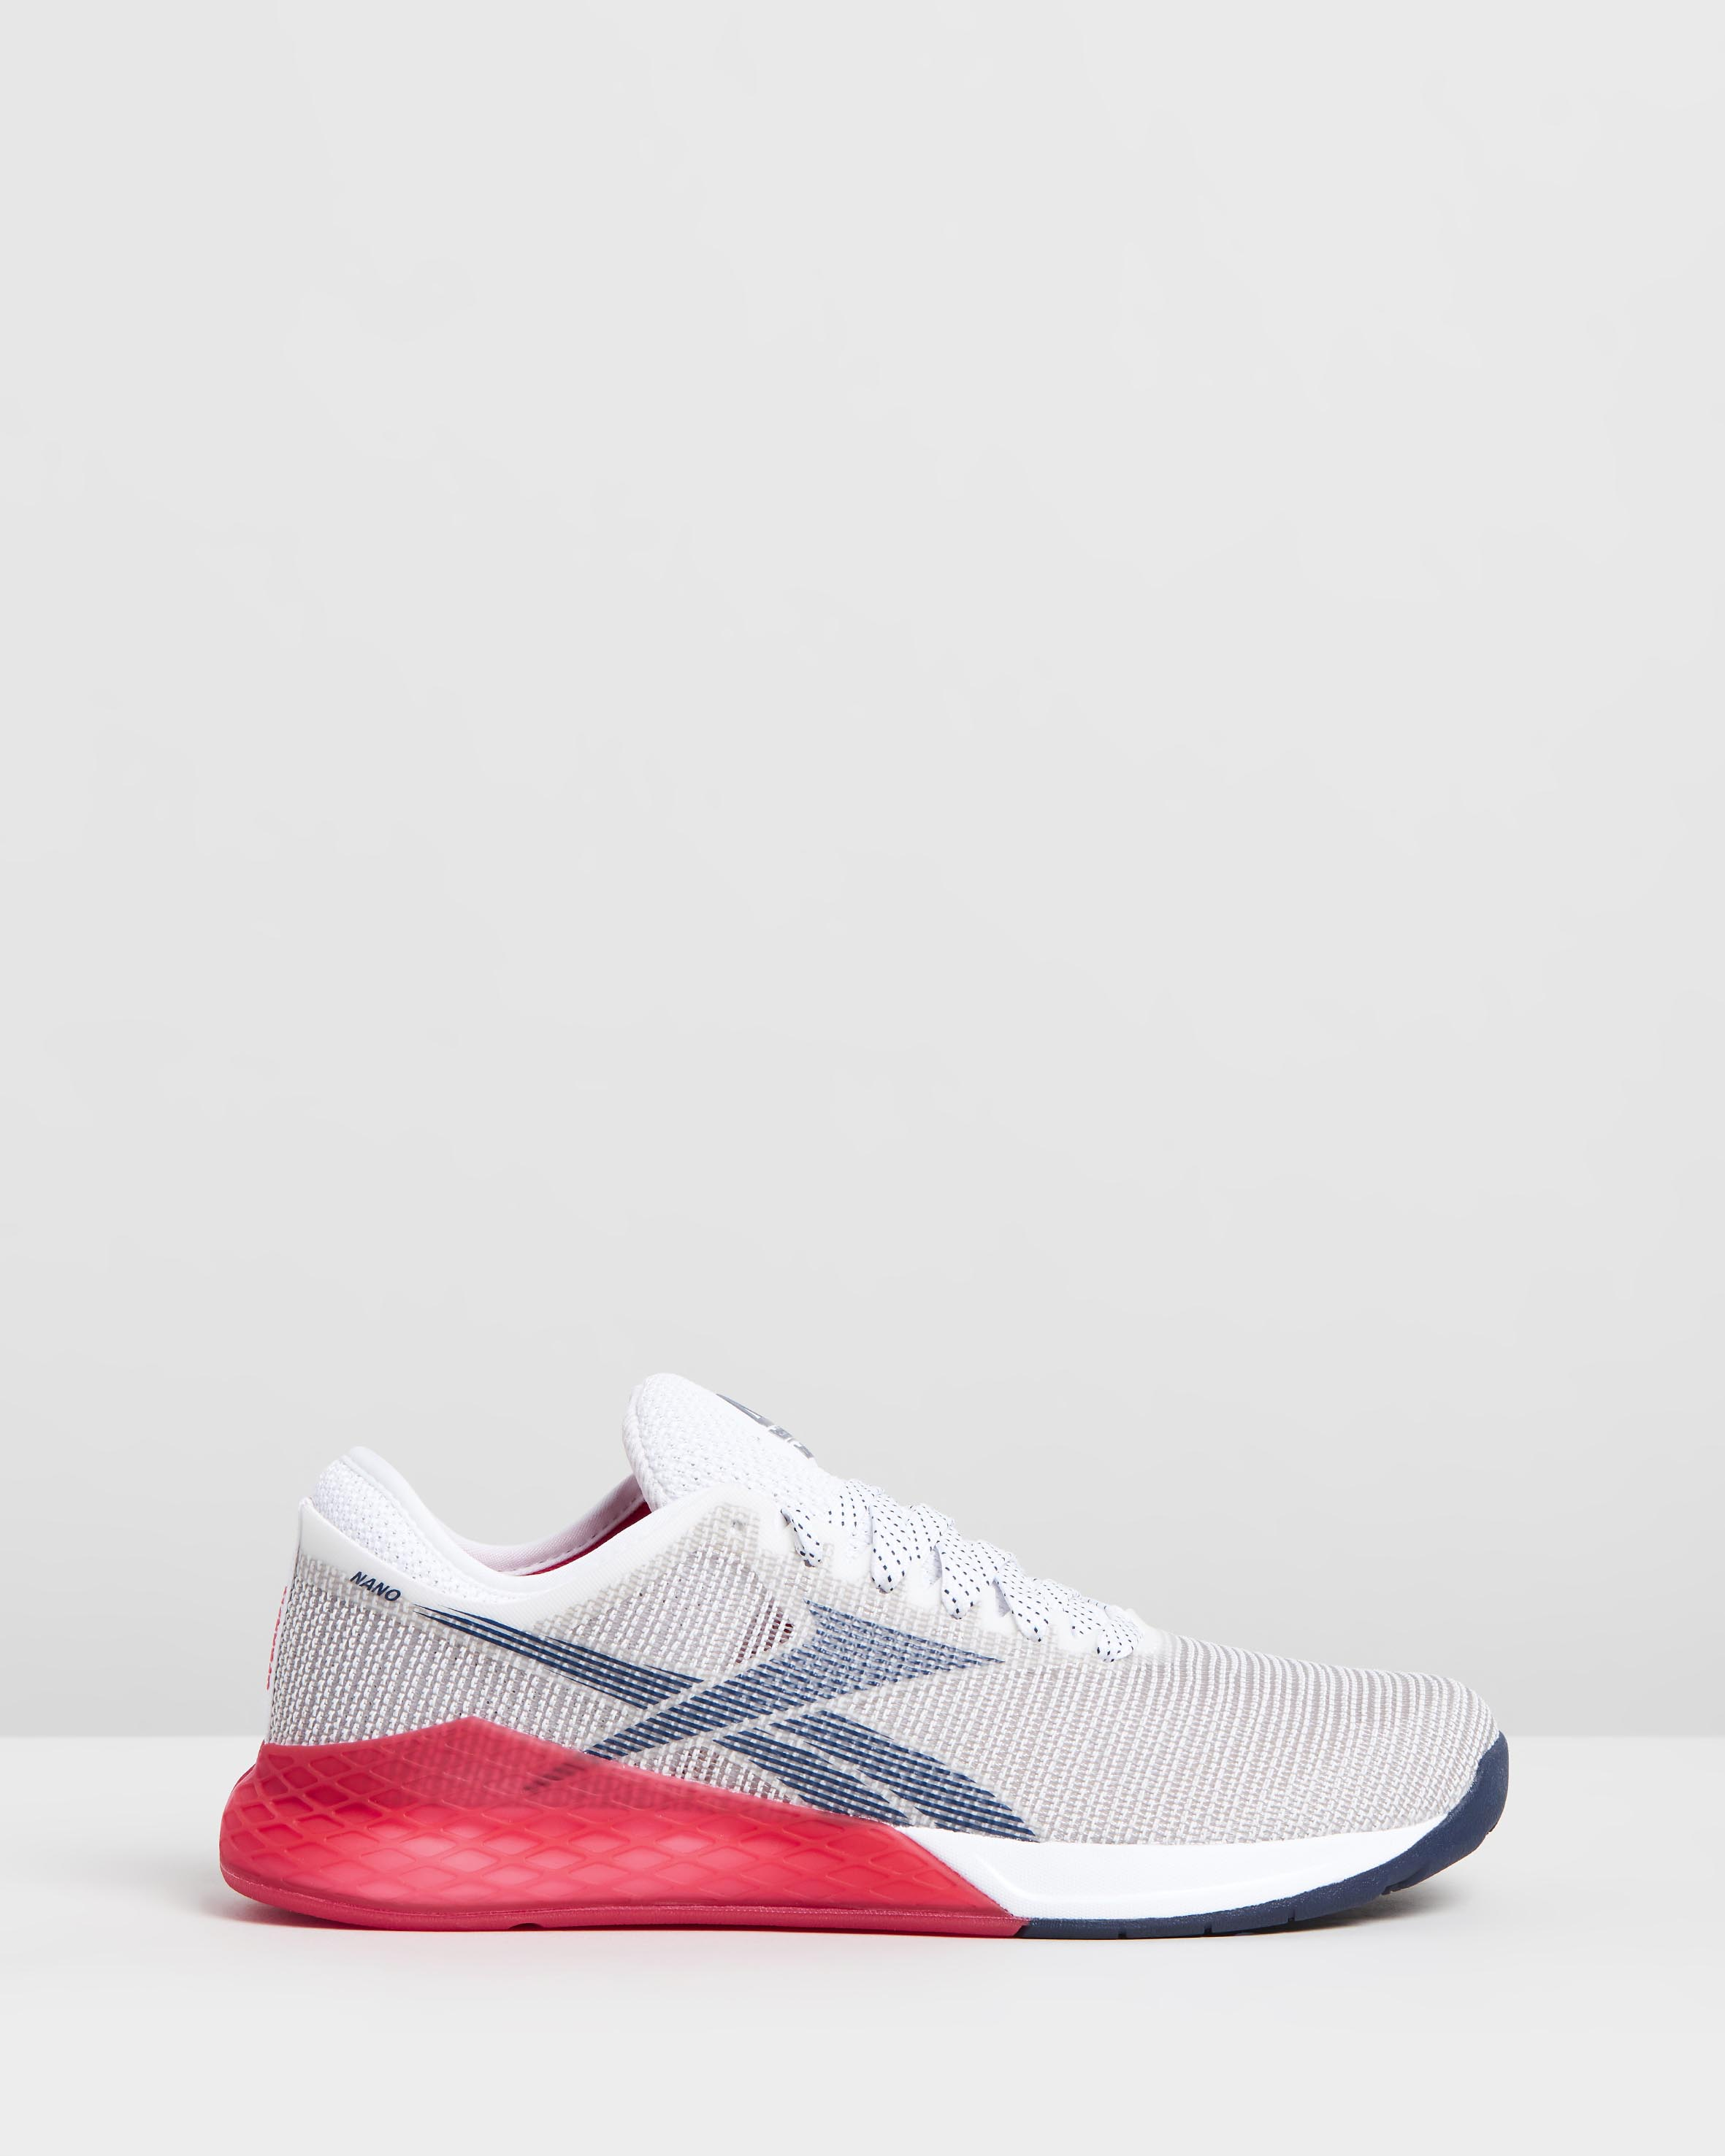 Reebok Red Sneaker Shoes Price in India | Buy Reebok Red